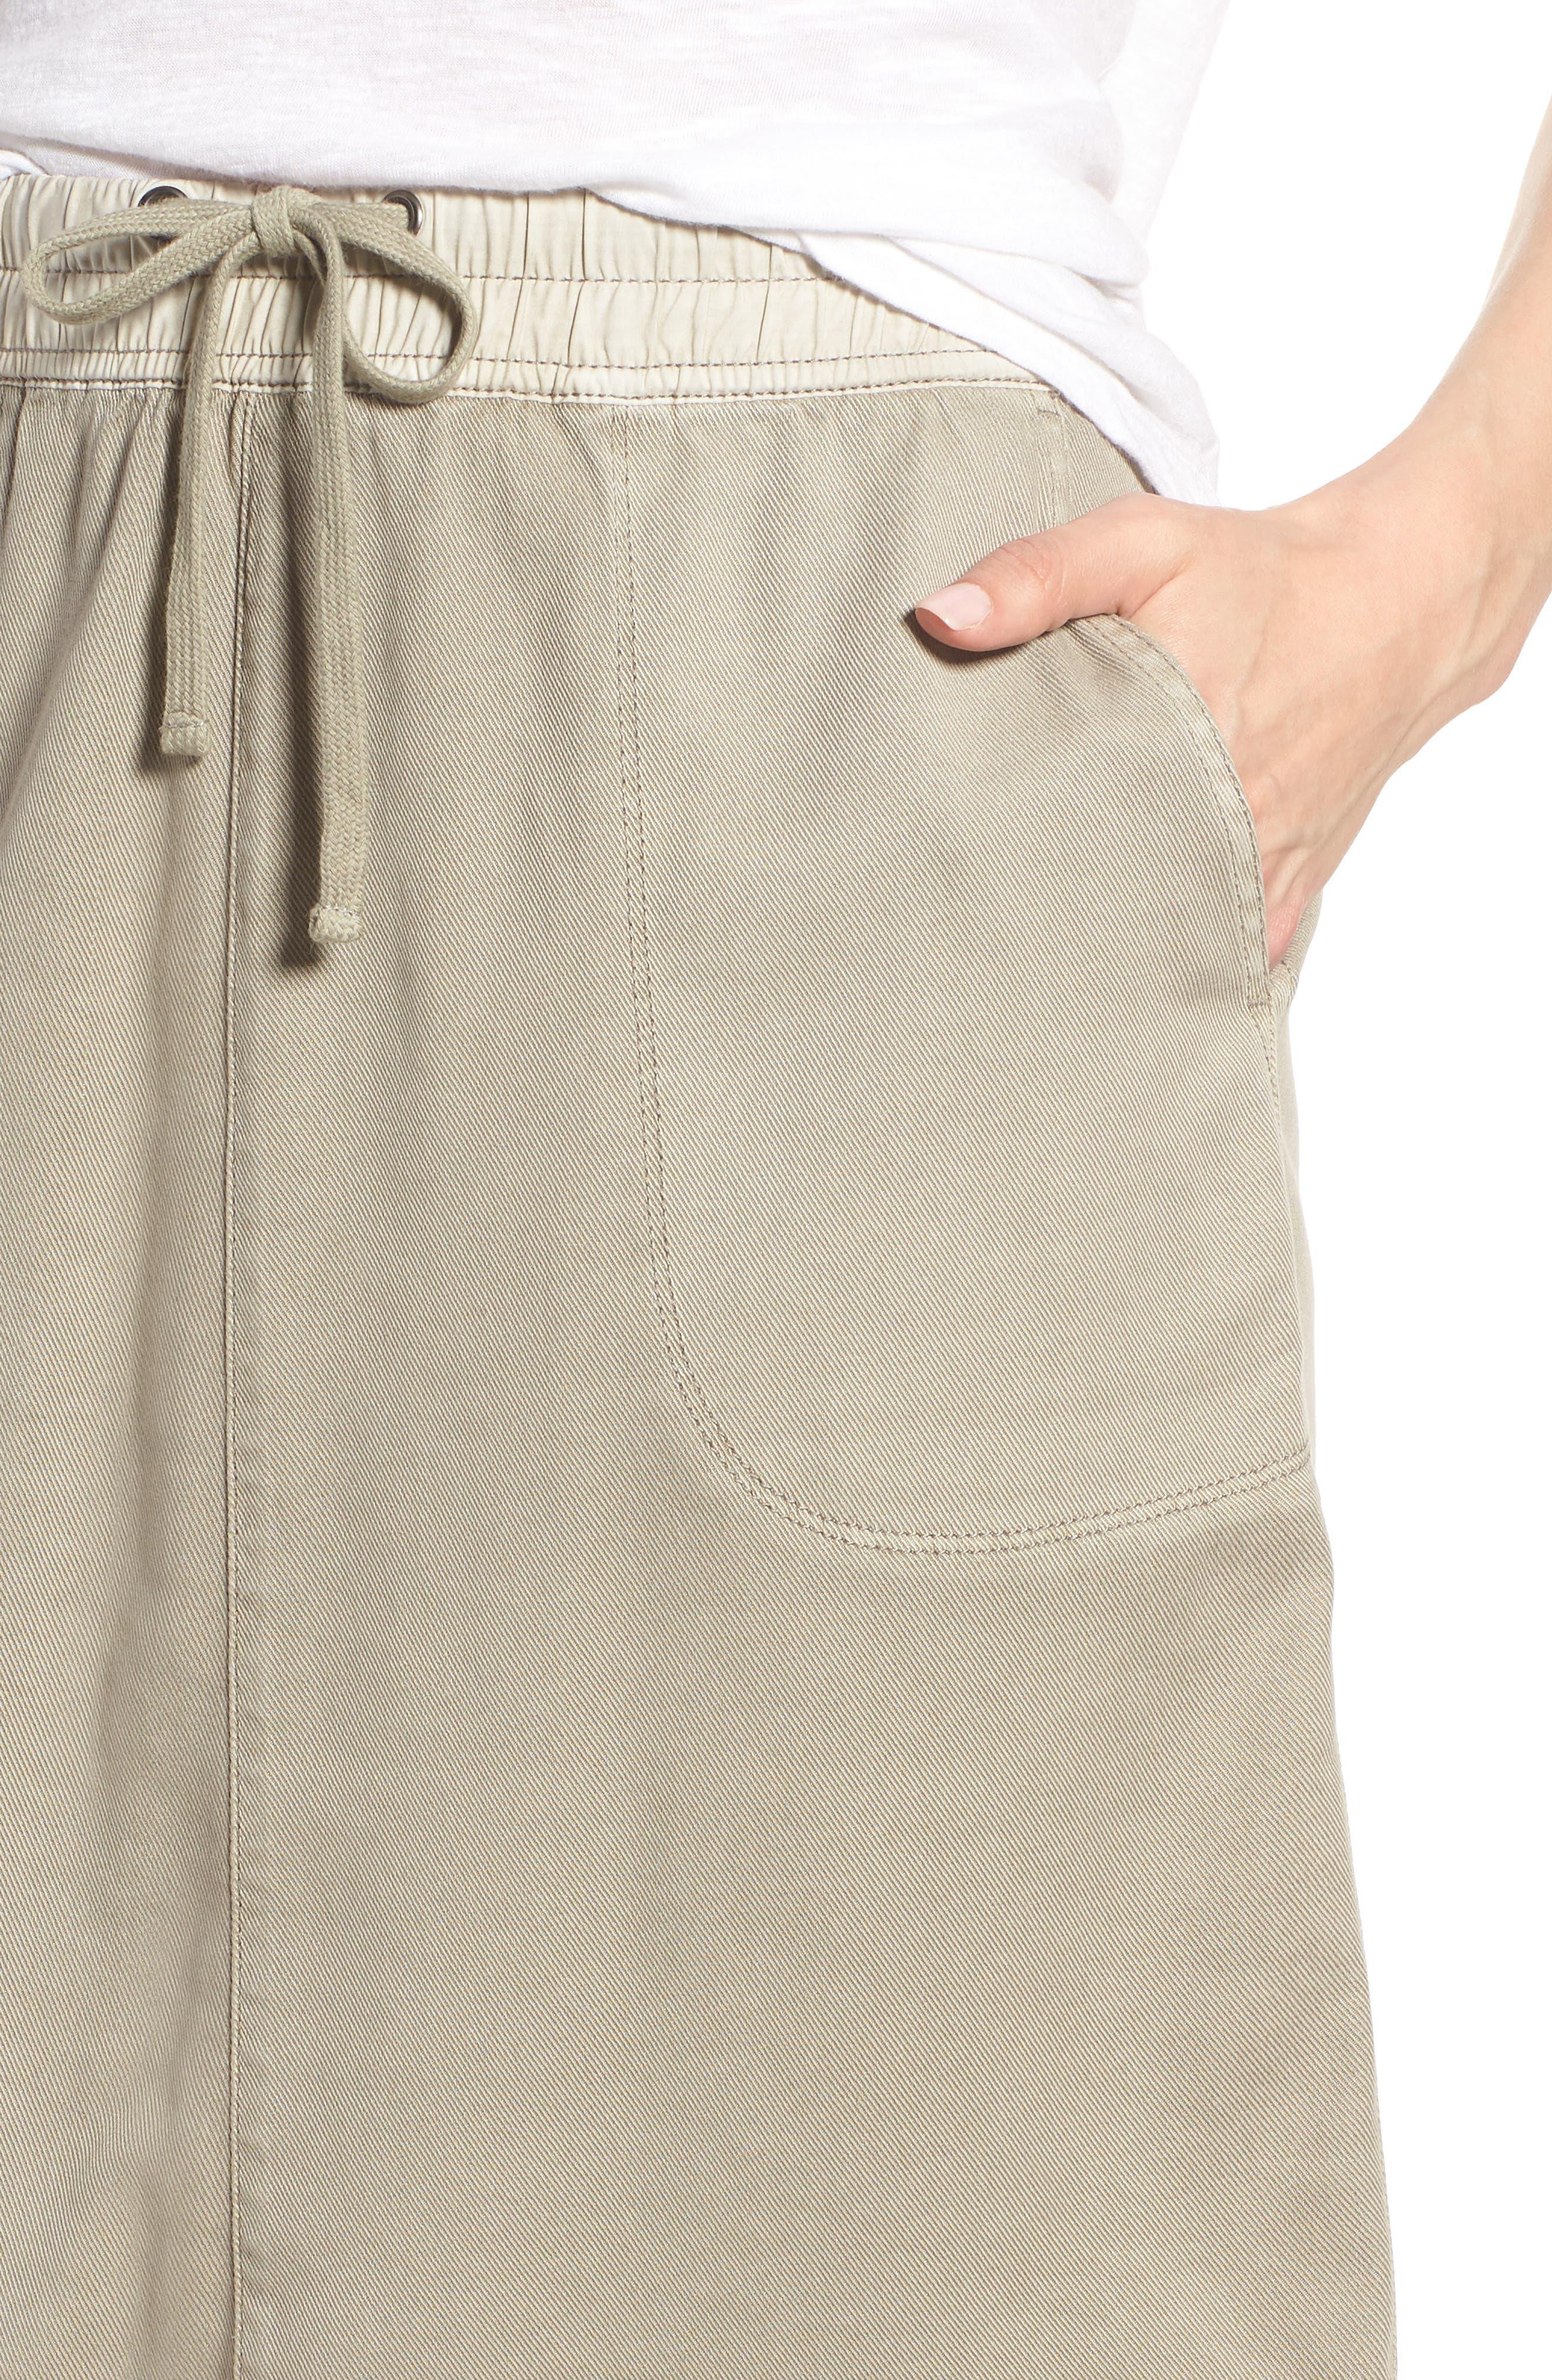 Open Road Skirt,                             Alternate thumbnail 4, color,                             FLAX